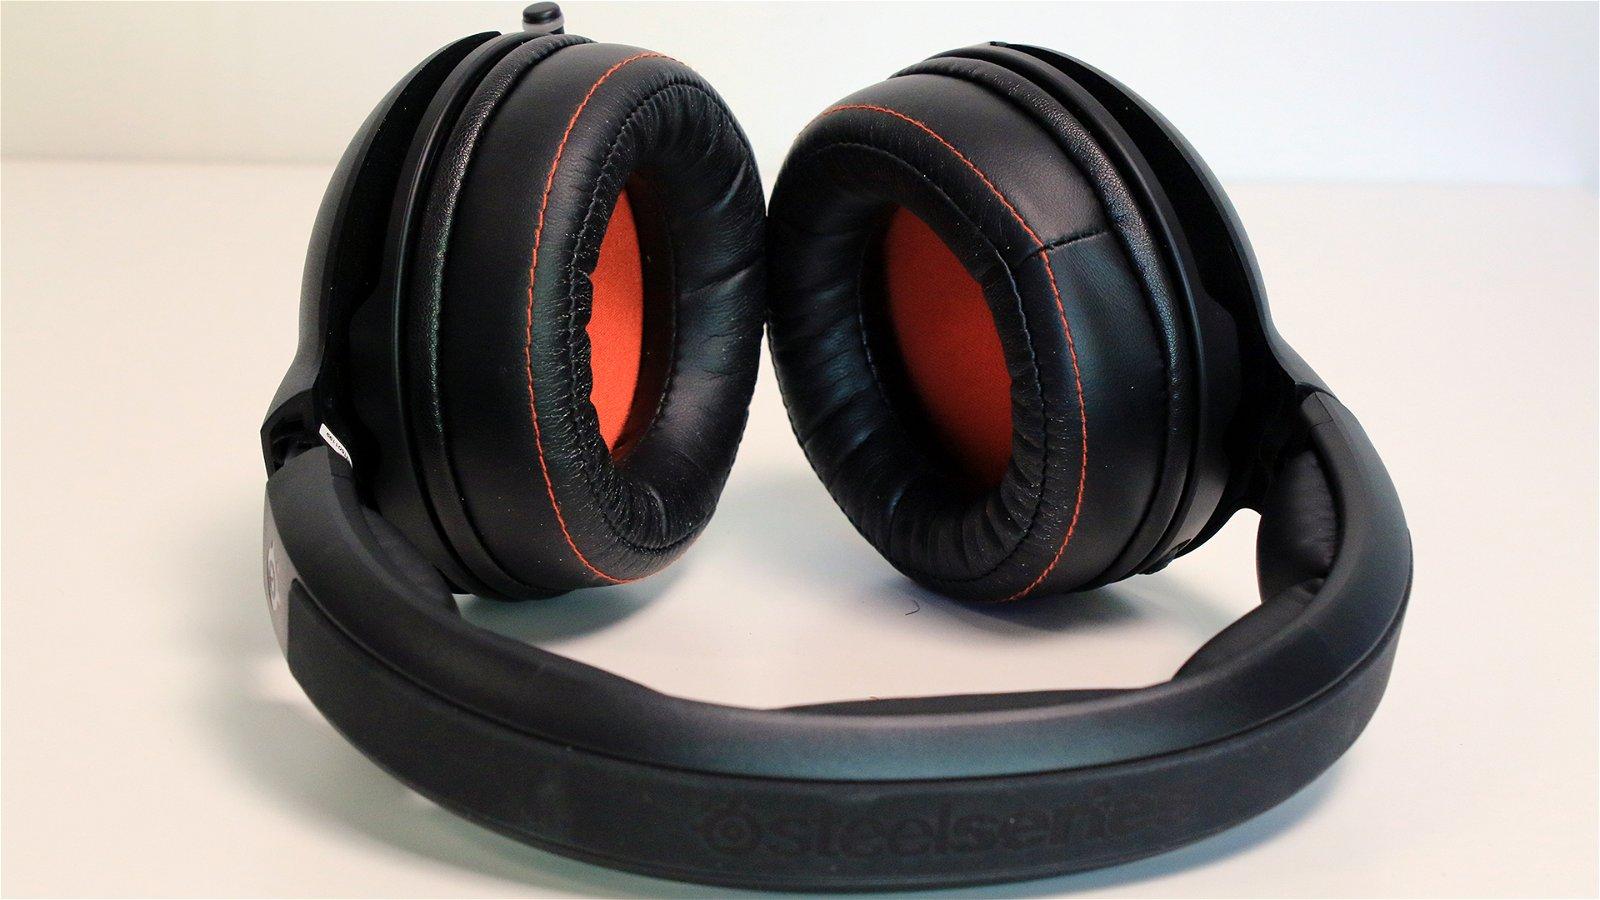 SteelSeries Siberia 800 Gaming Headset (Hardware) Review 5